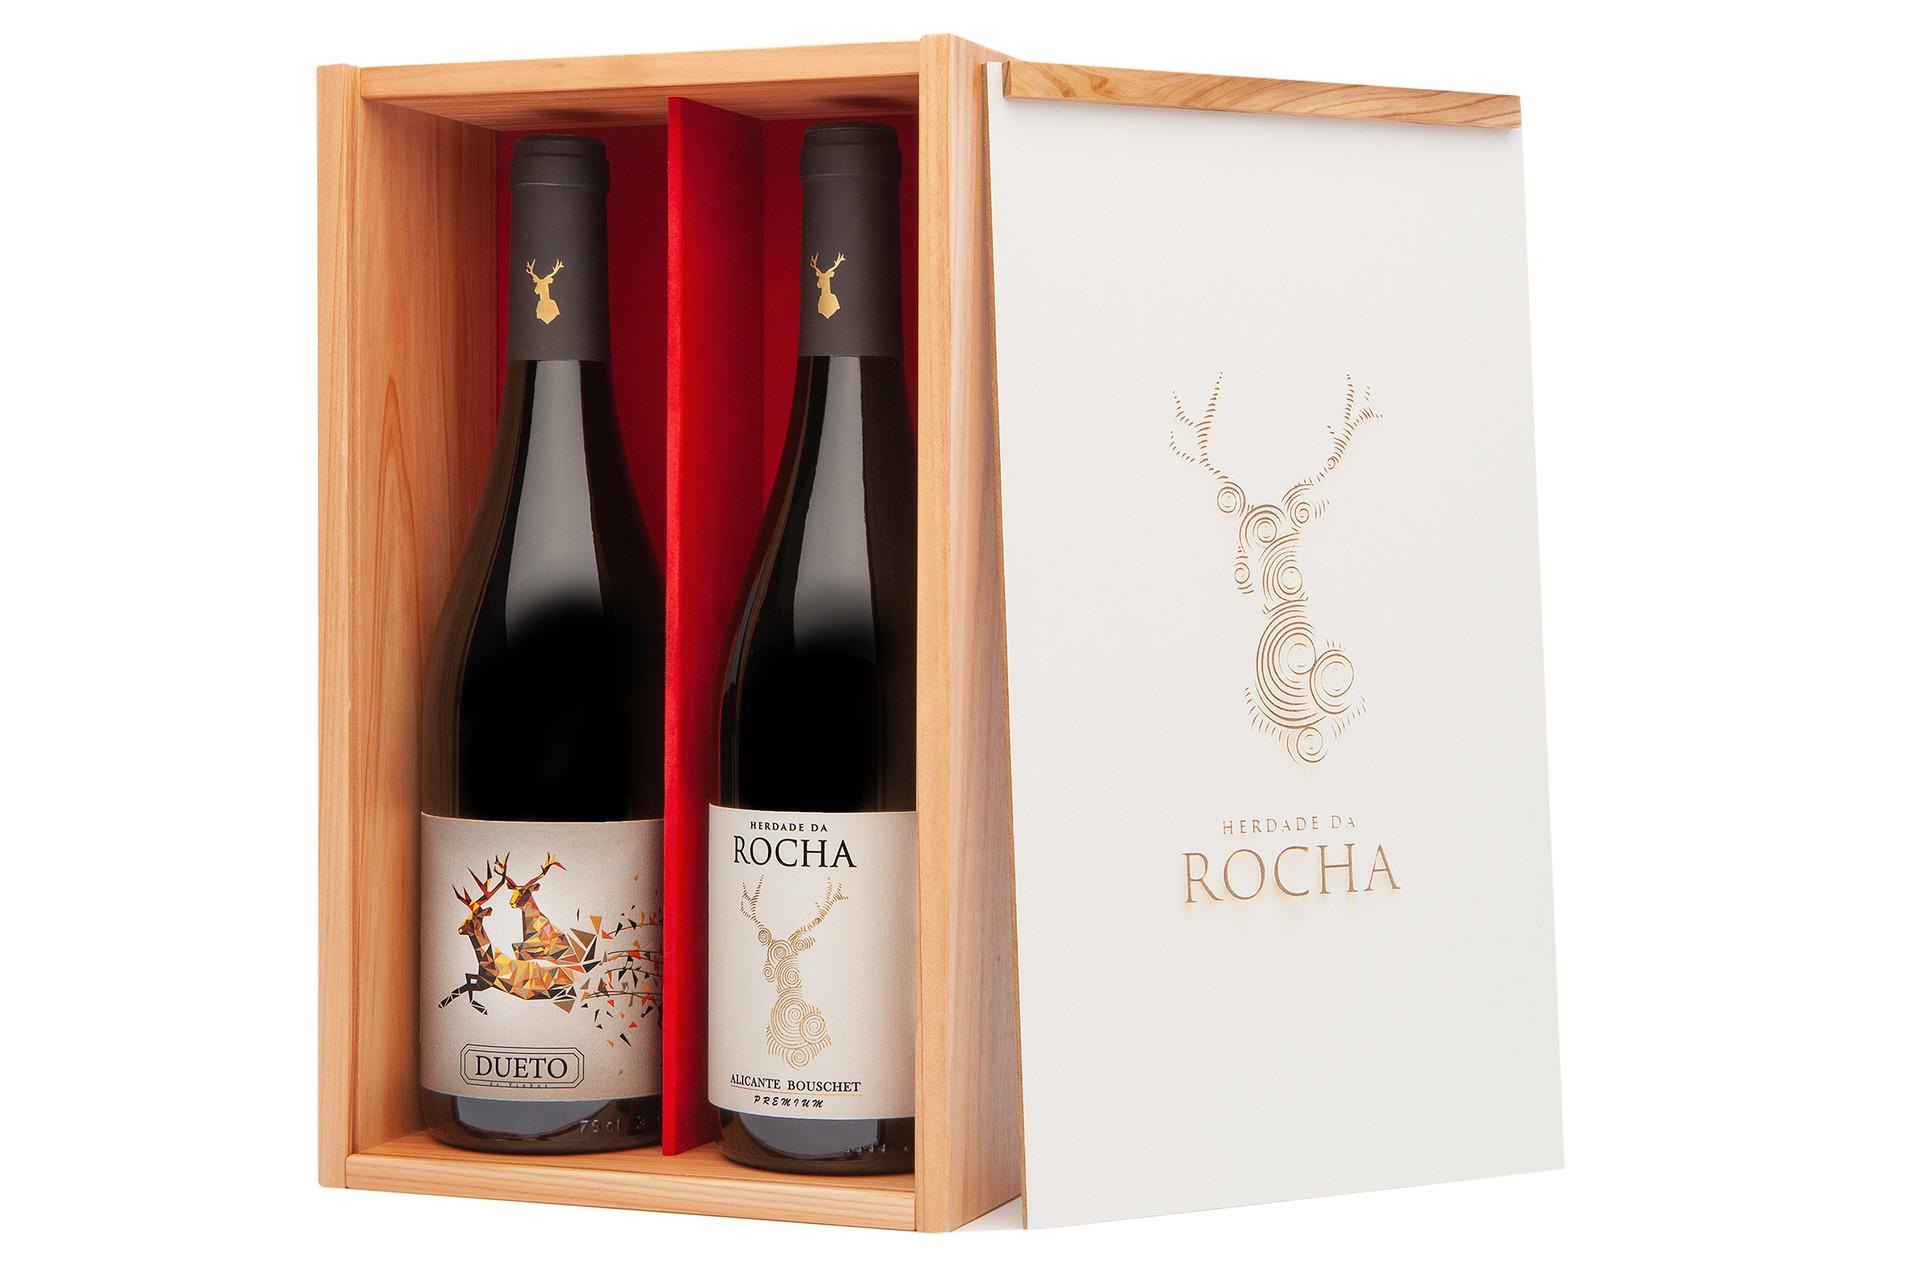 Pack 2 Garrafas - Herdade da Rocha Alicante Bouschet Premium + Dueto (Alentejo e Douro)